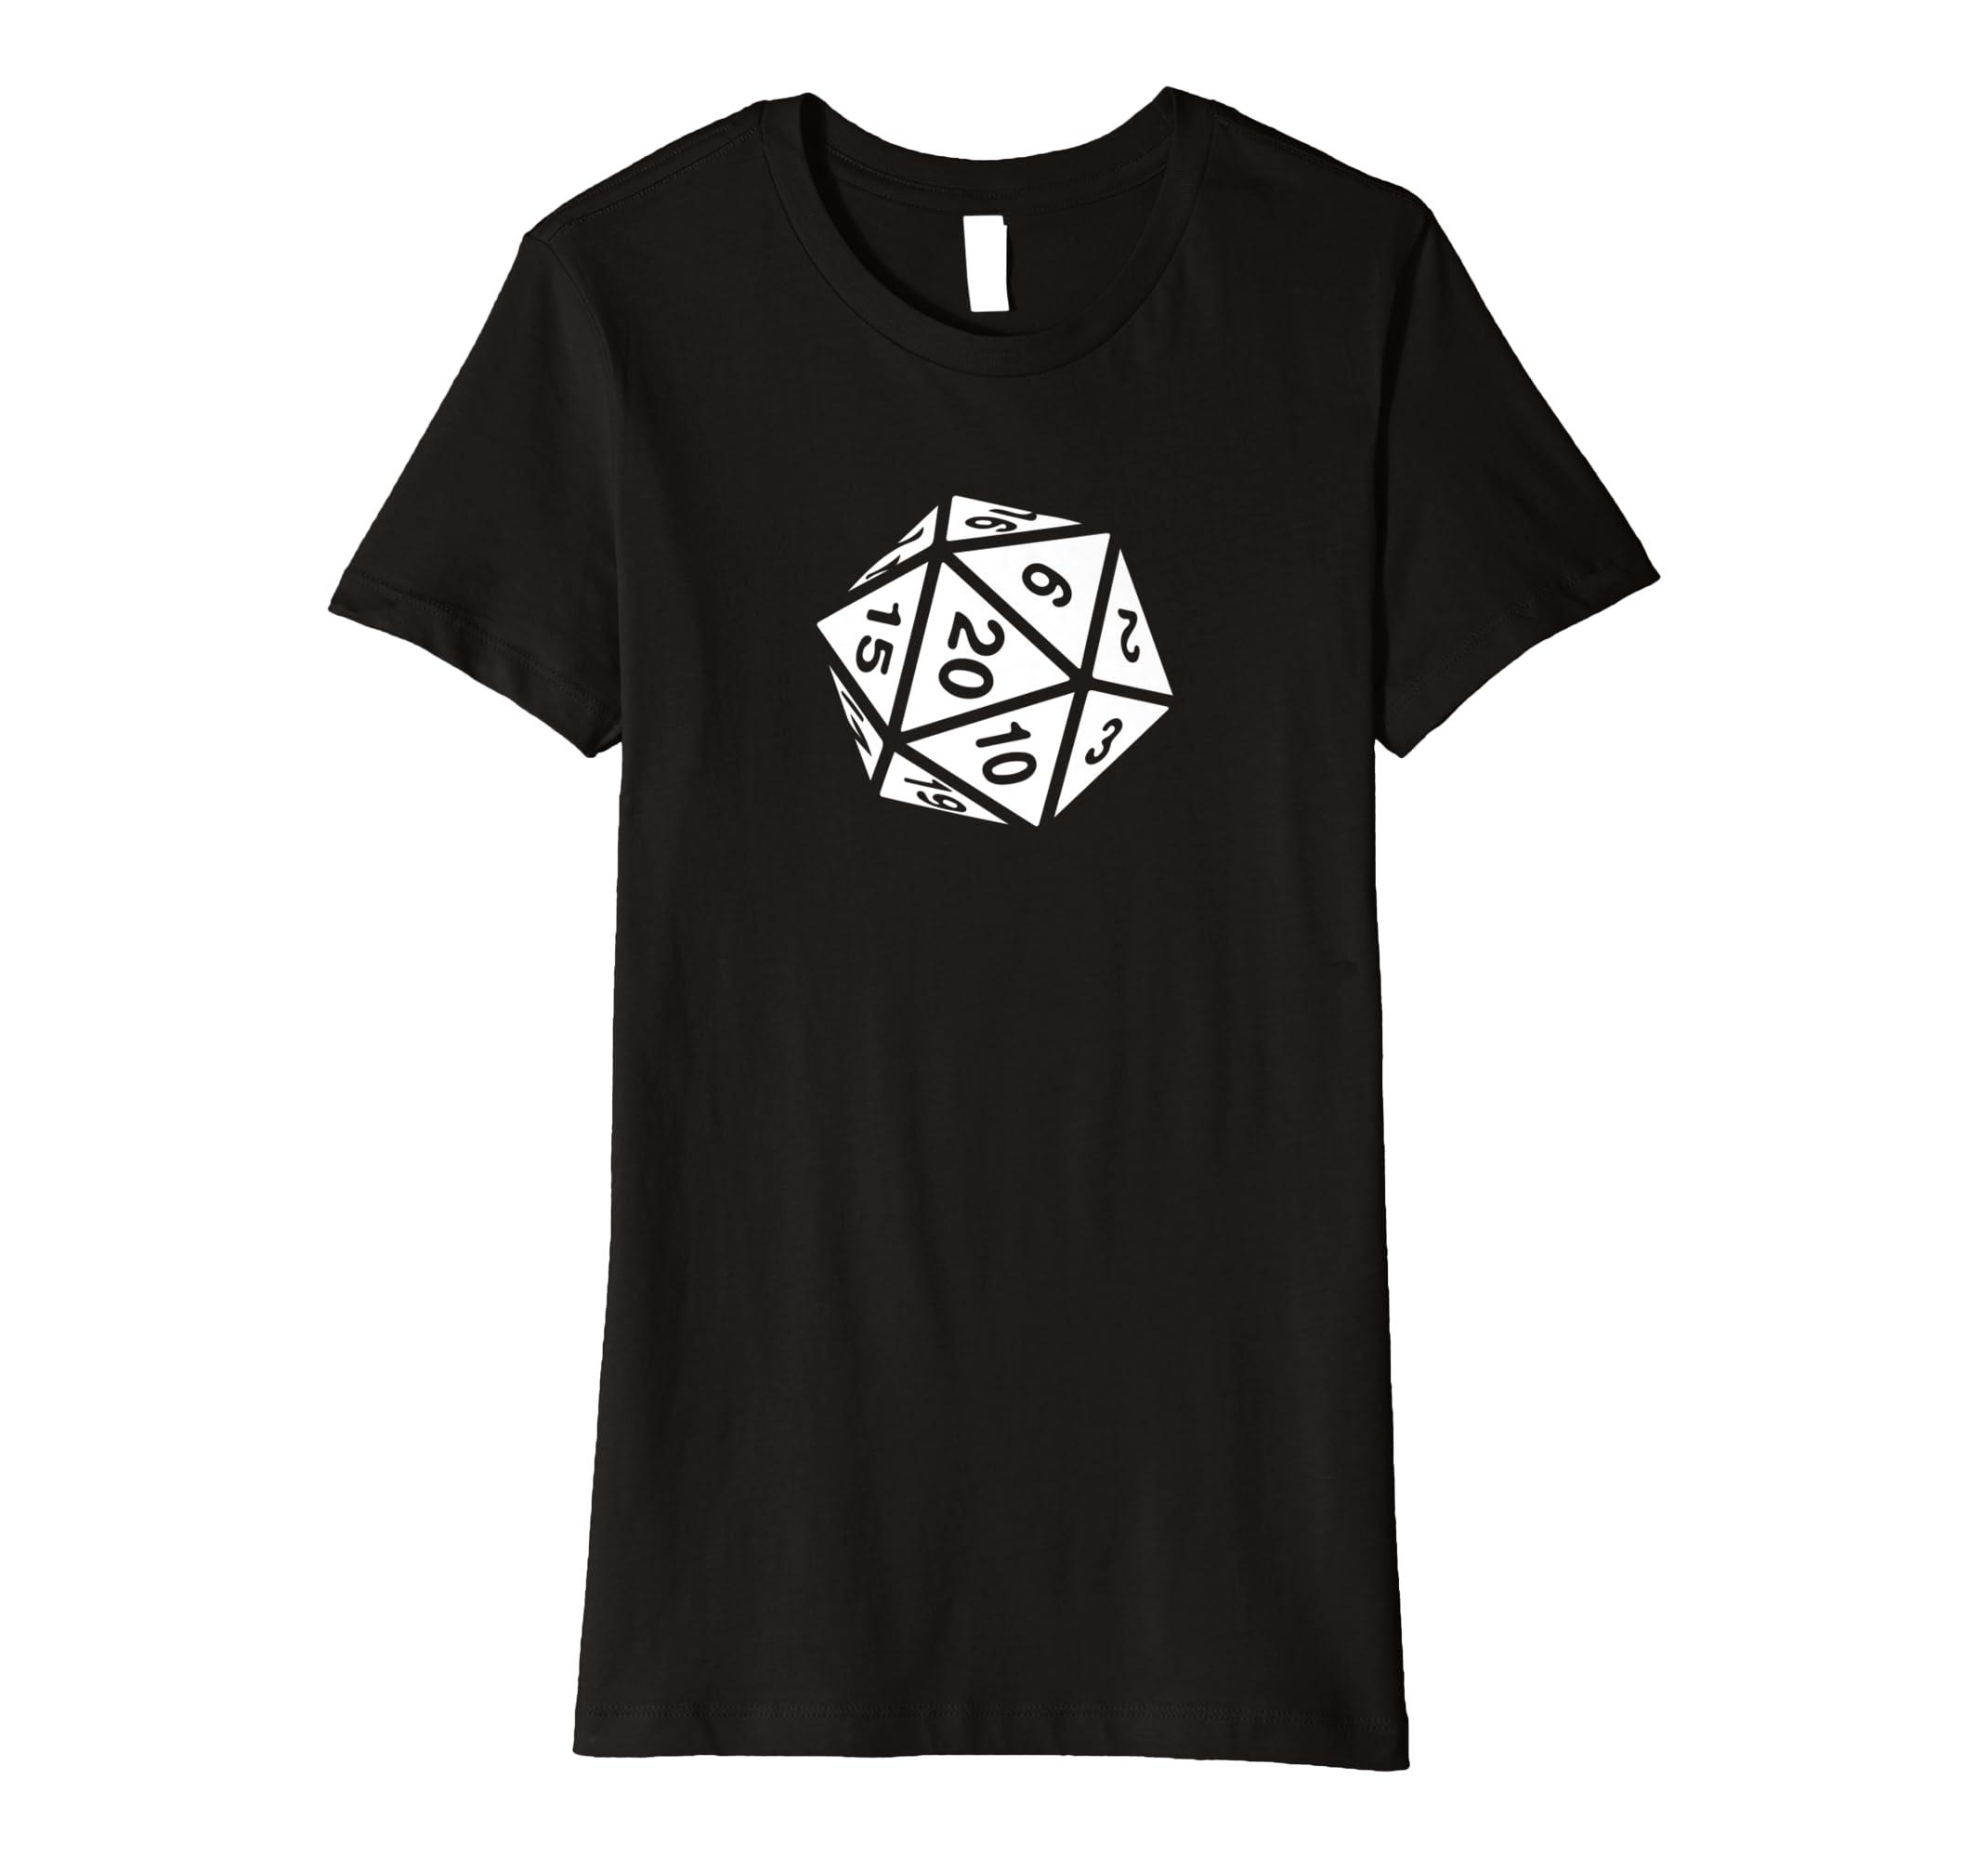 94f2a9db5 Amazon.com: RPG Dice Shirt d20 | White Design: Clothing